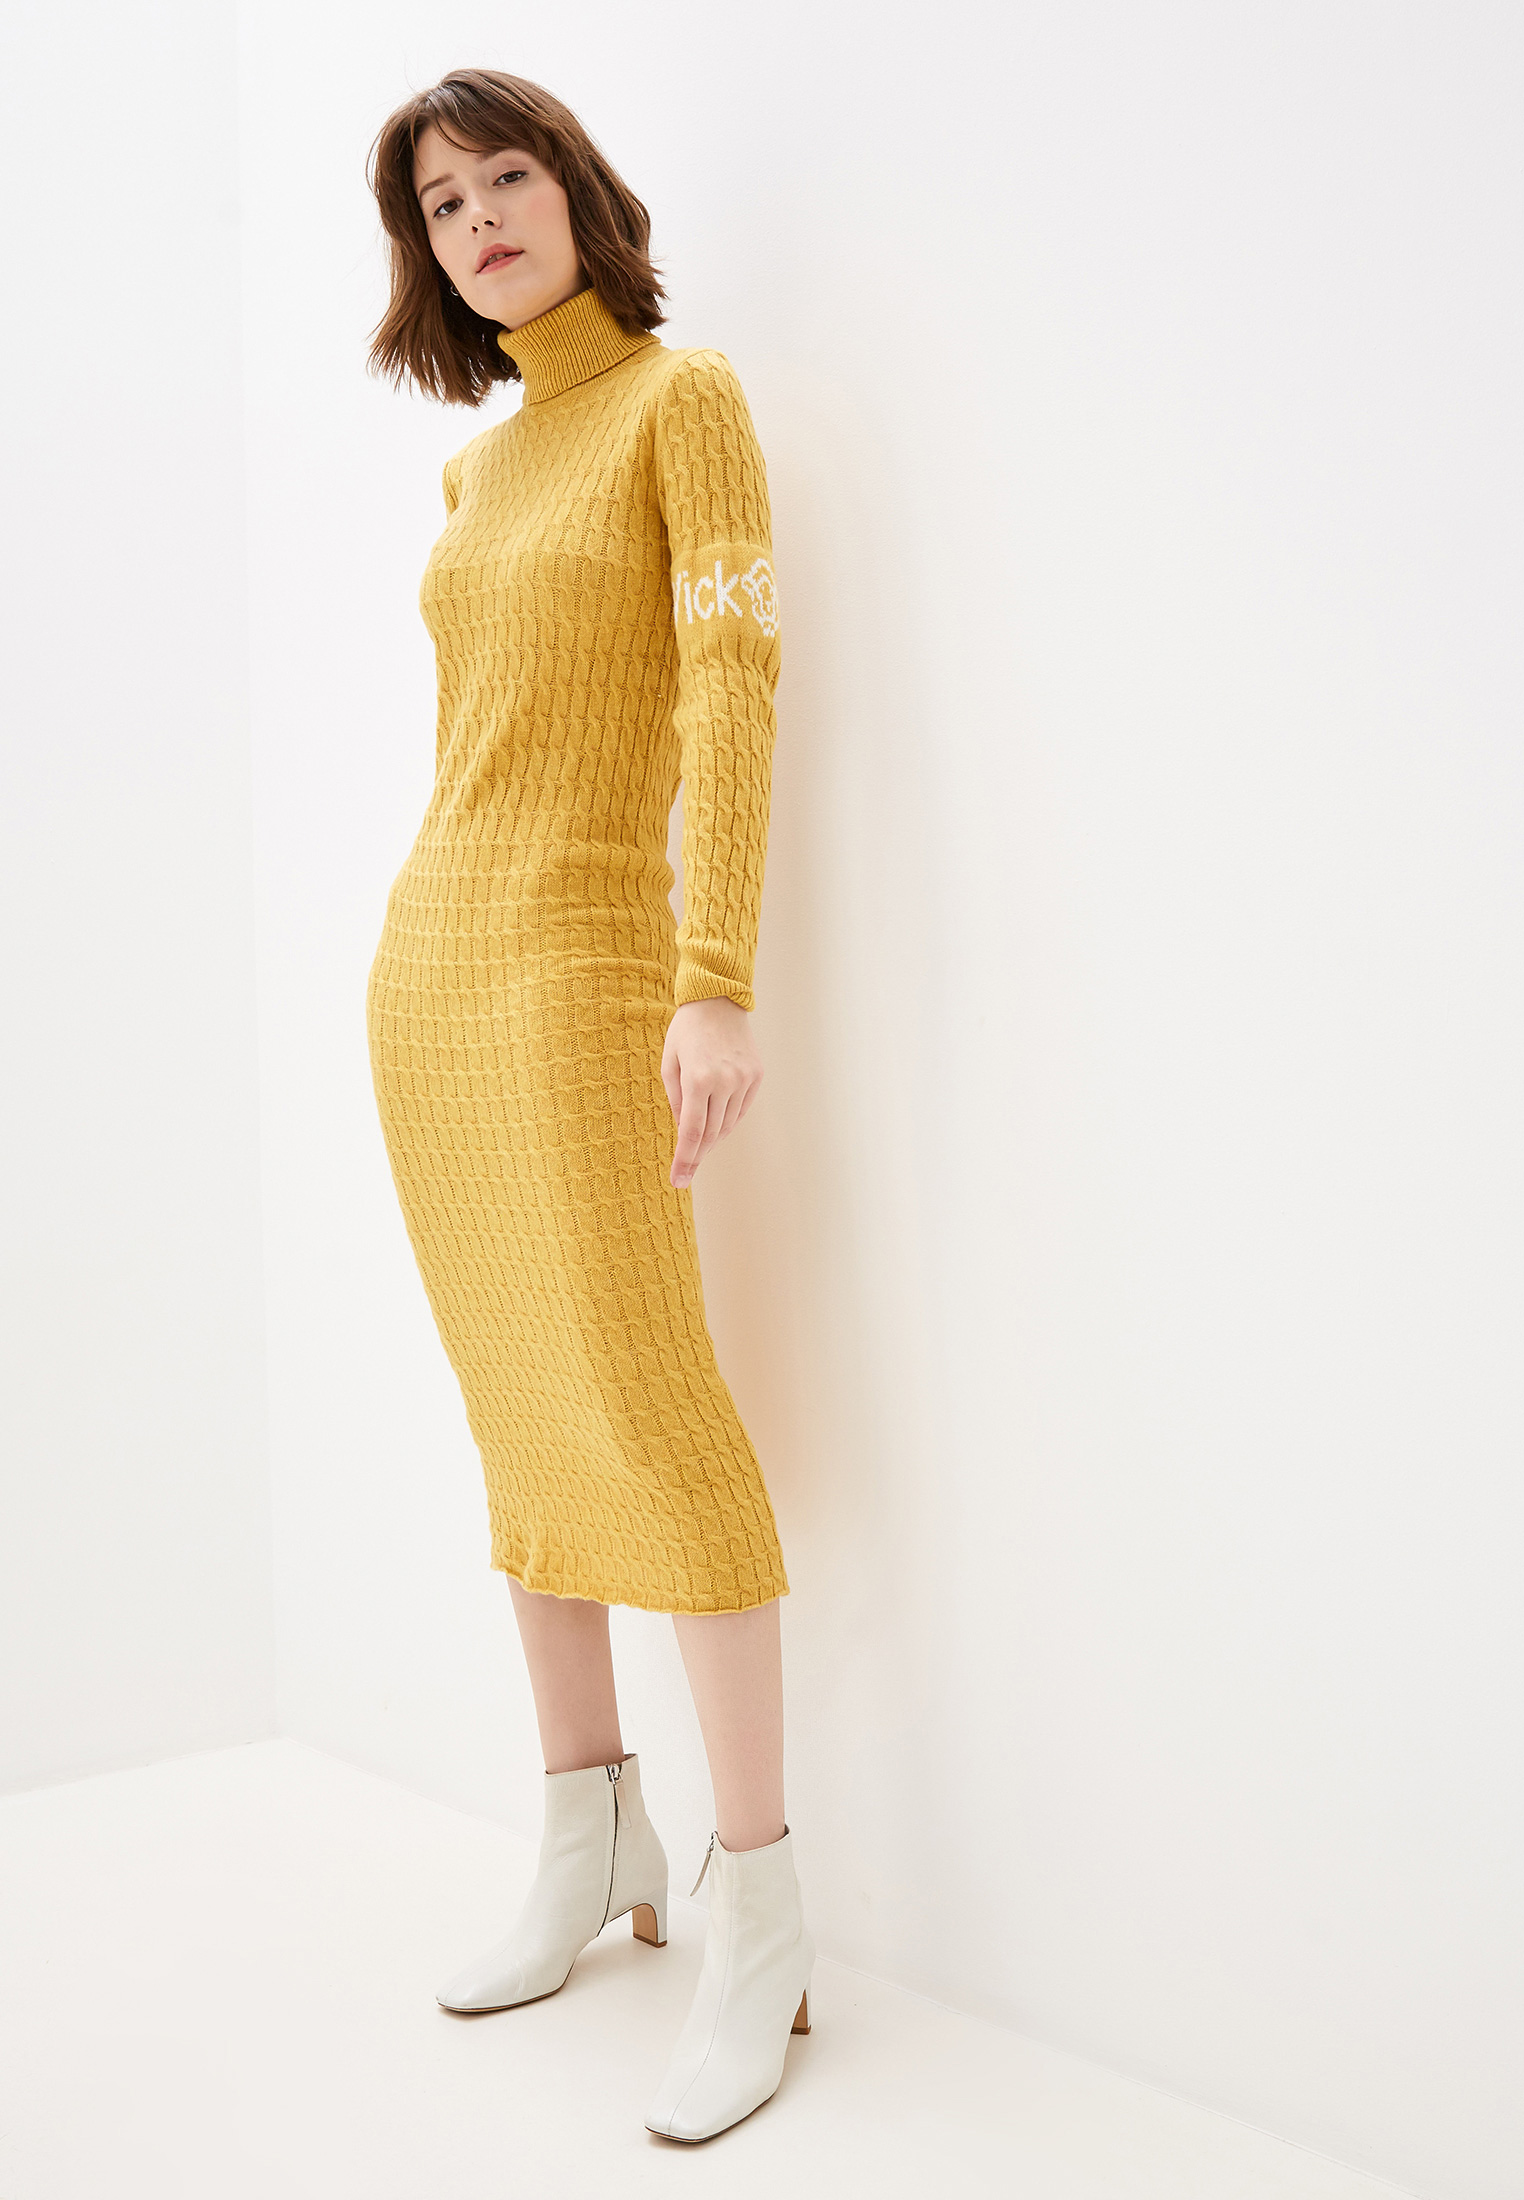 Вязаное платье Vickwool PM1326-3